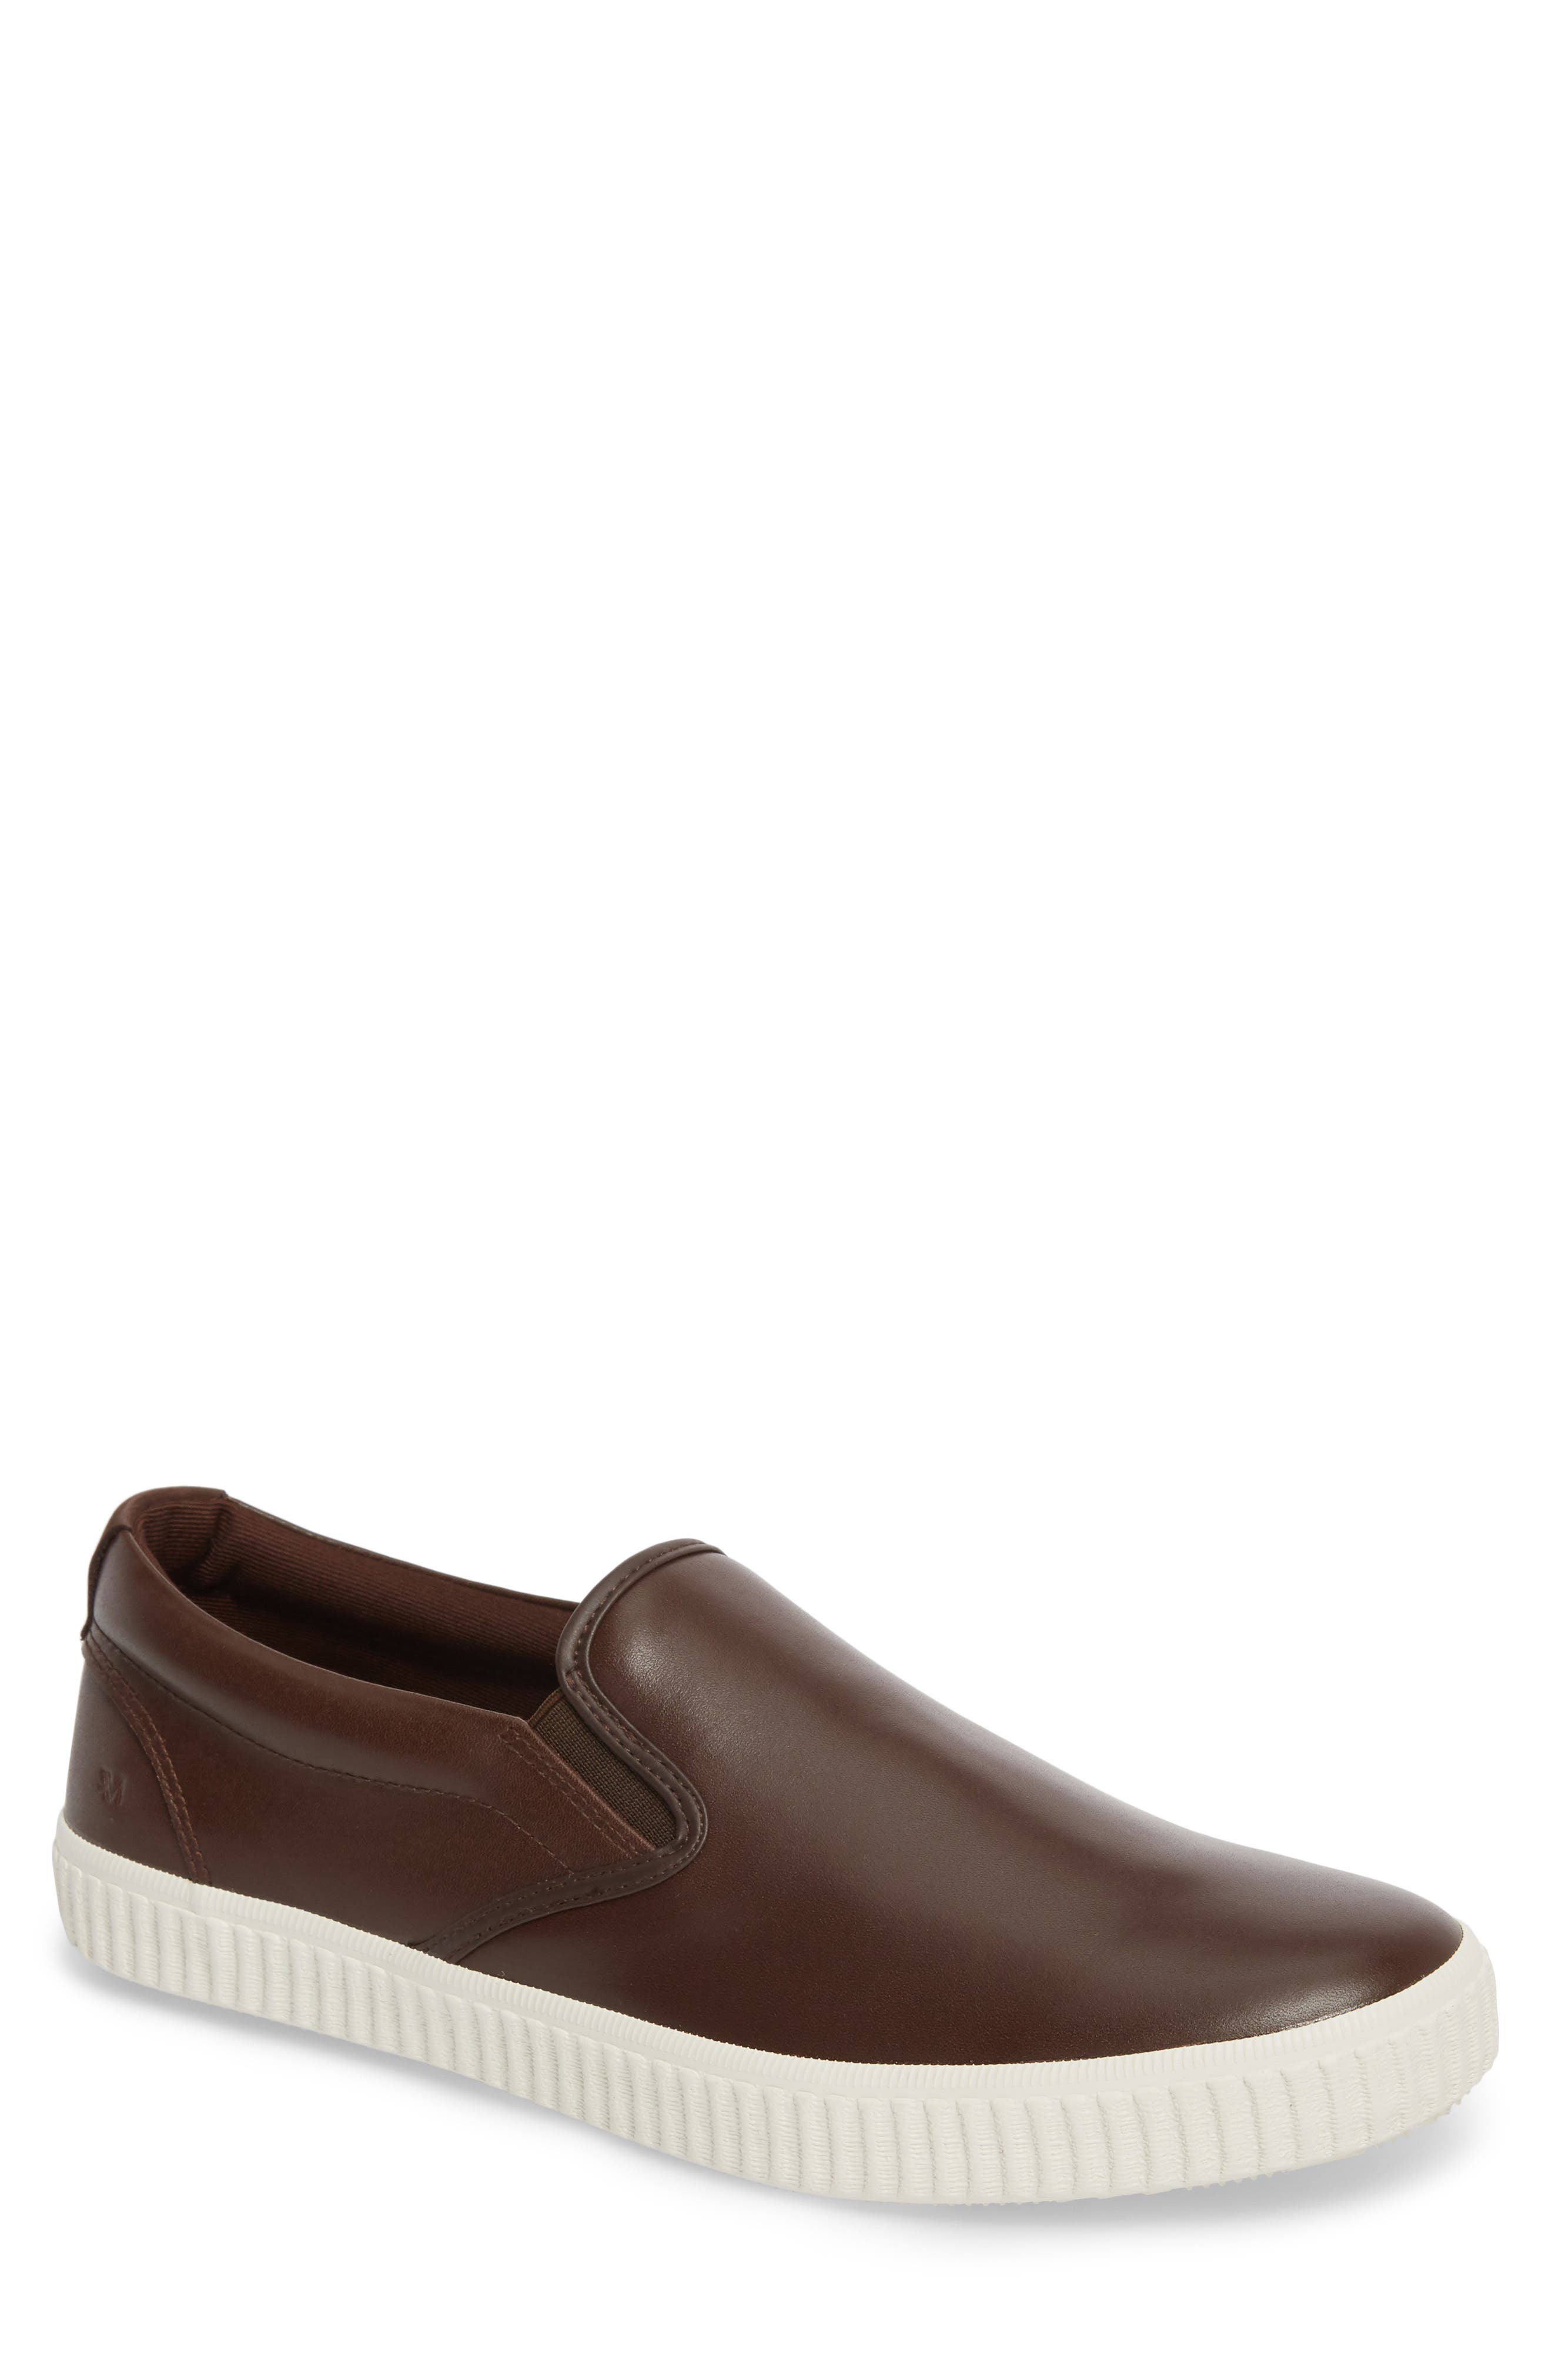 Riverside Slip-On Sneaker,                             Main thumbnail 1, color,                             Brown/ Off White Leather